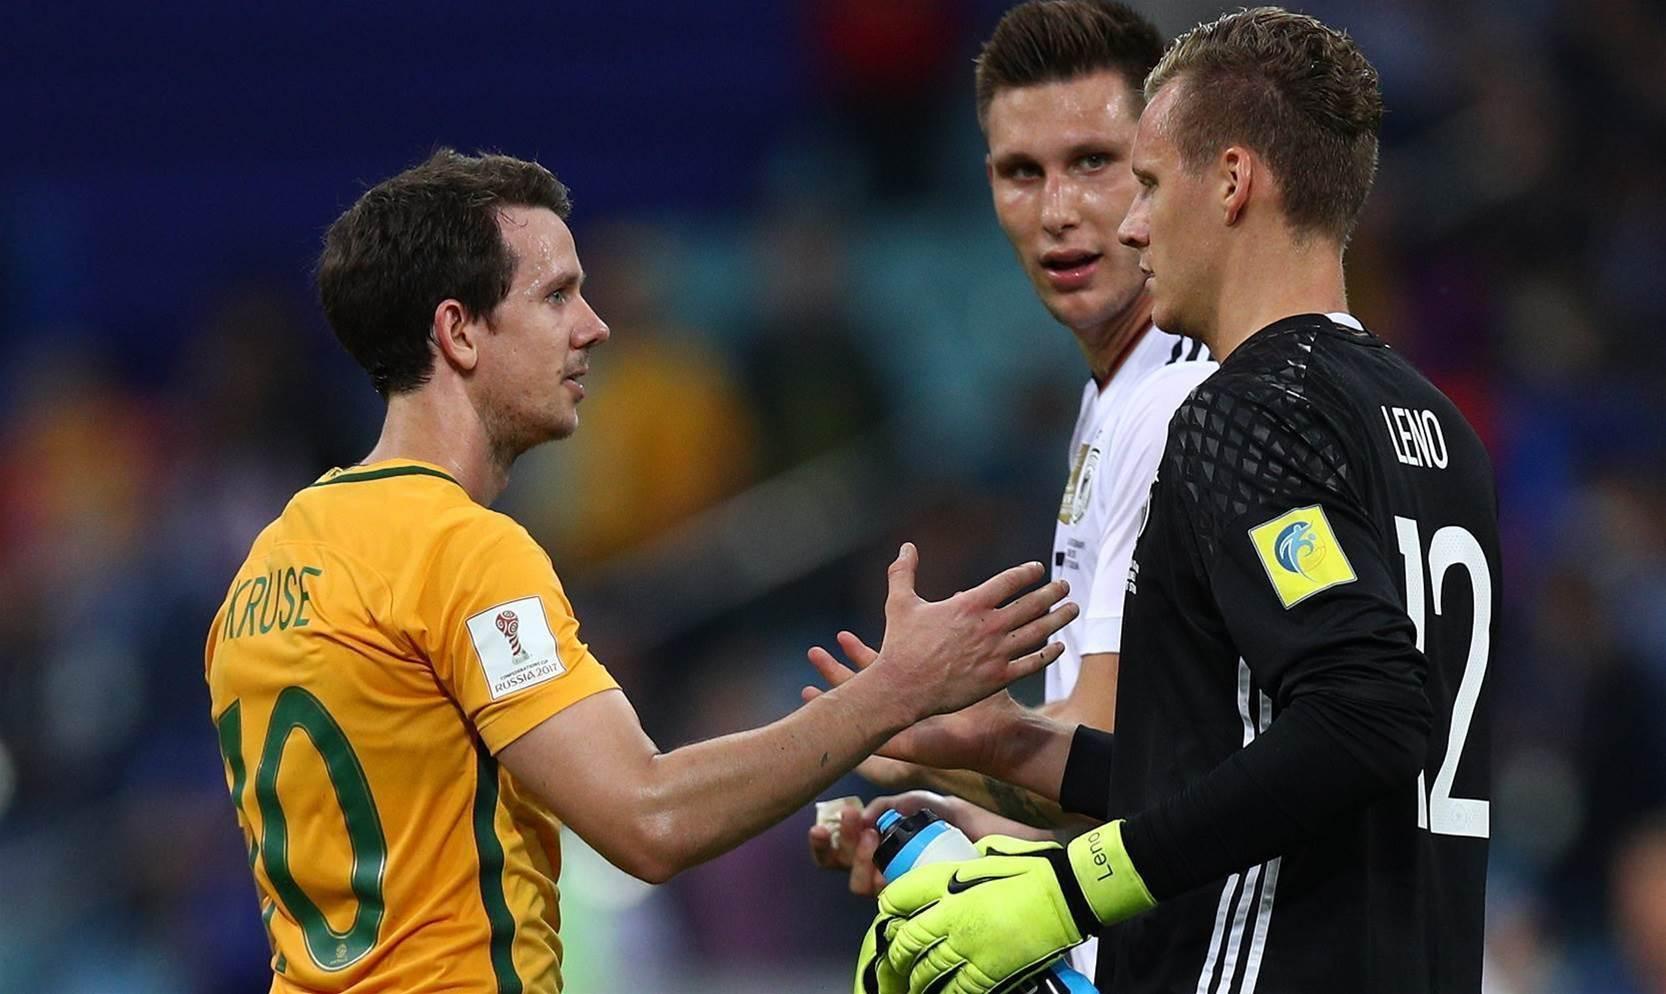 Kruse rules out A-League return